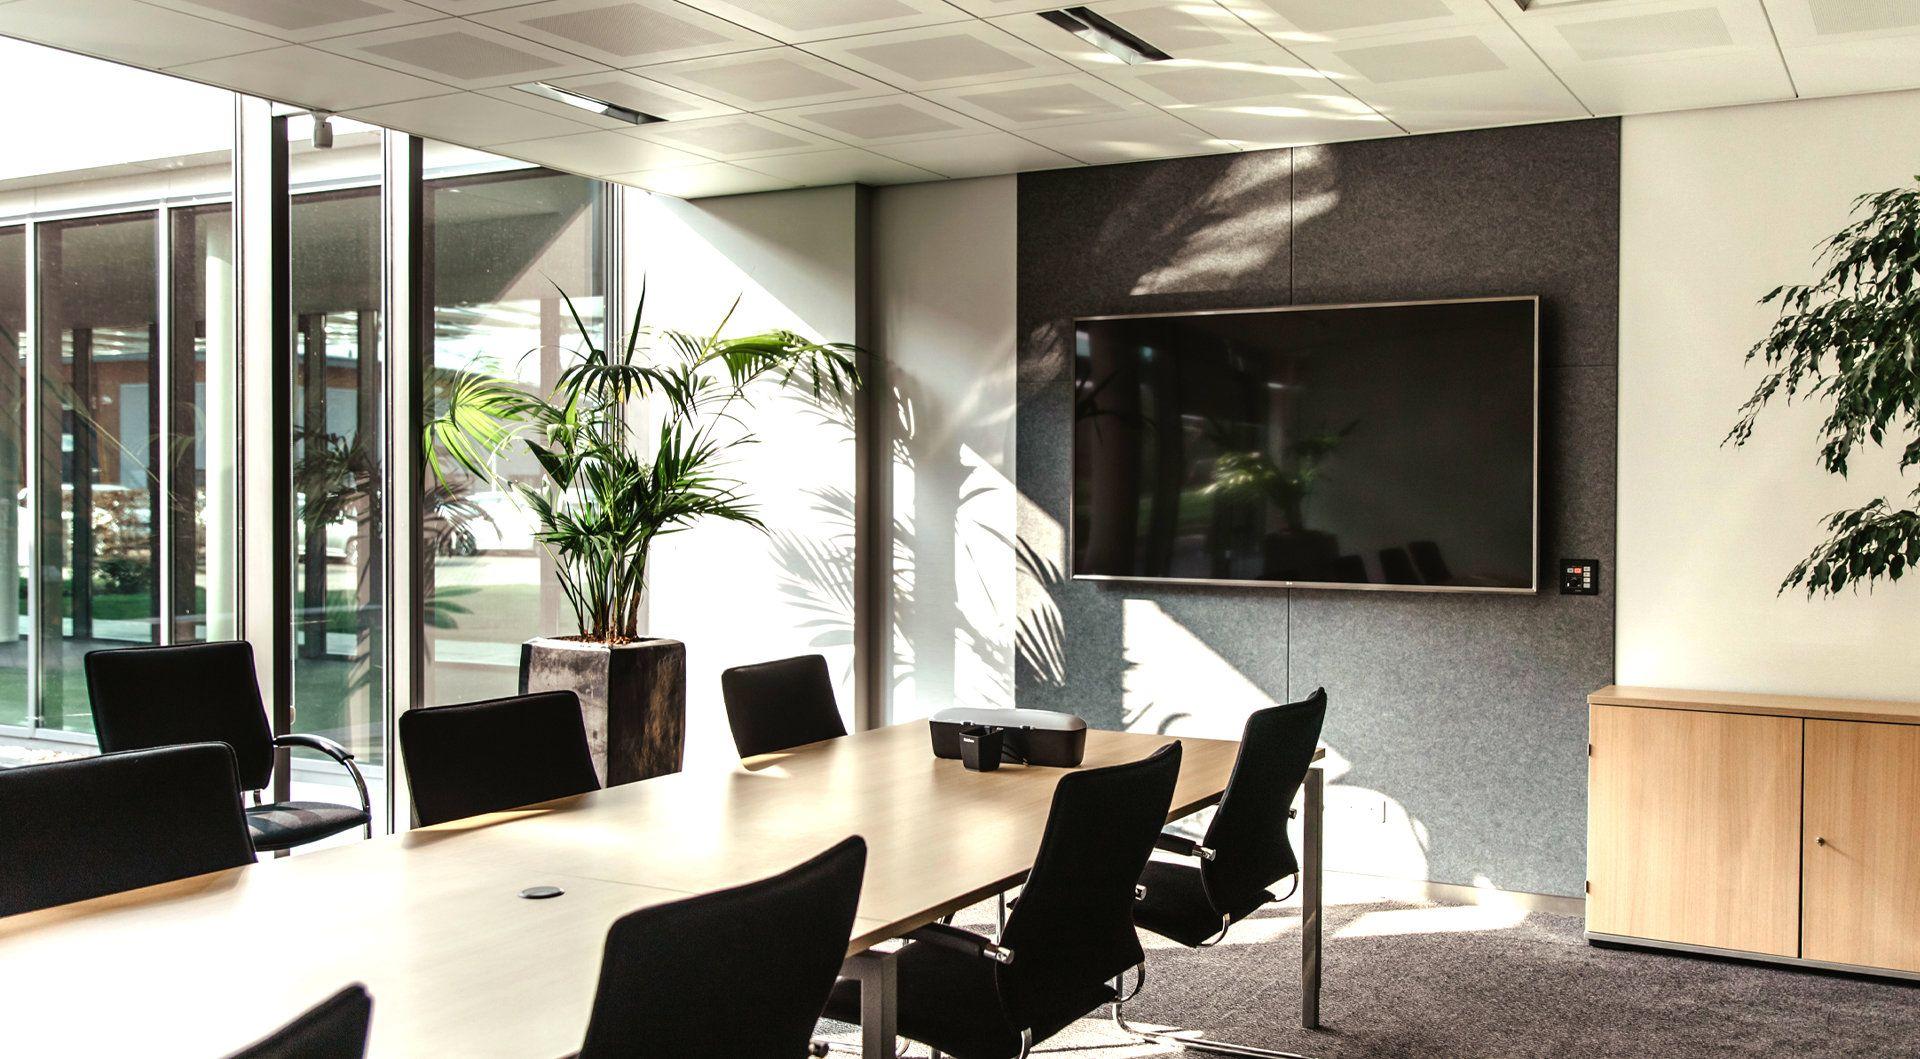 "Chief XPD1U-EU flat panel vloer standaard 2,03 m (80"") Draagbare flatscreen vloerstandaard Zwart - Case studie de vries"